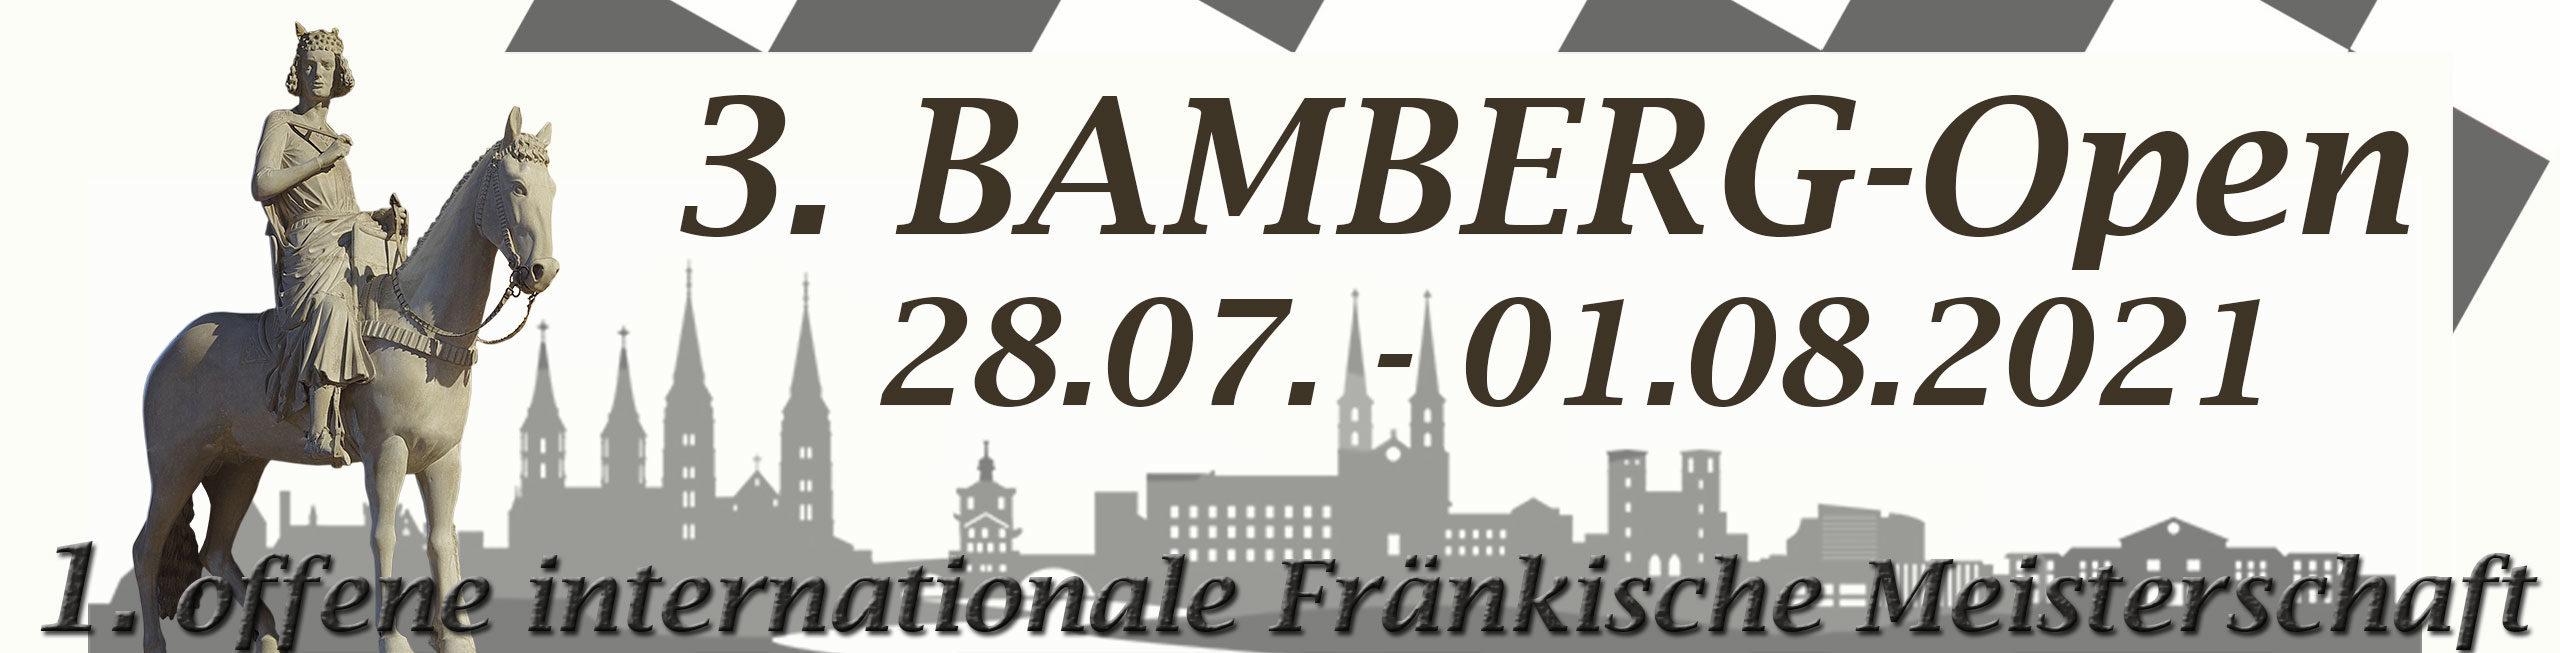 Bamberg-Open — Offizielle Turnierseite